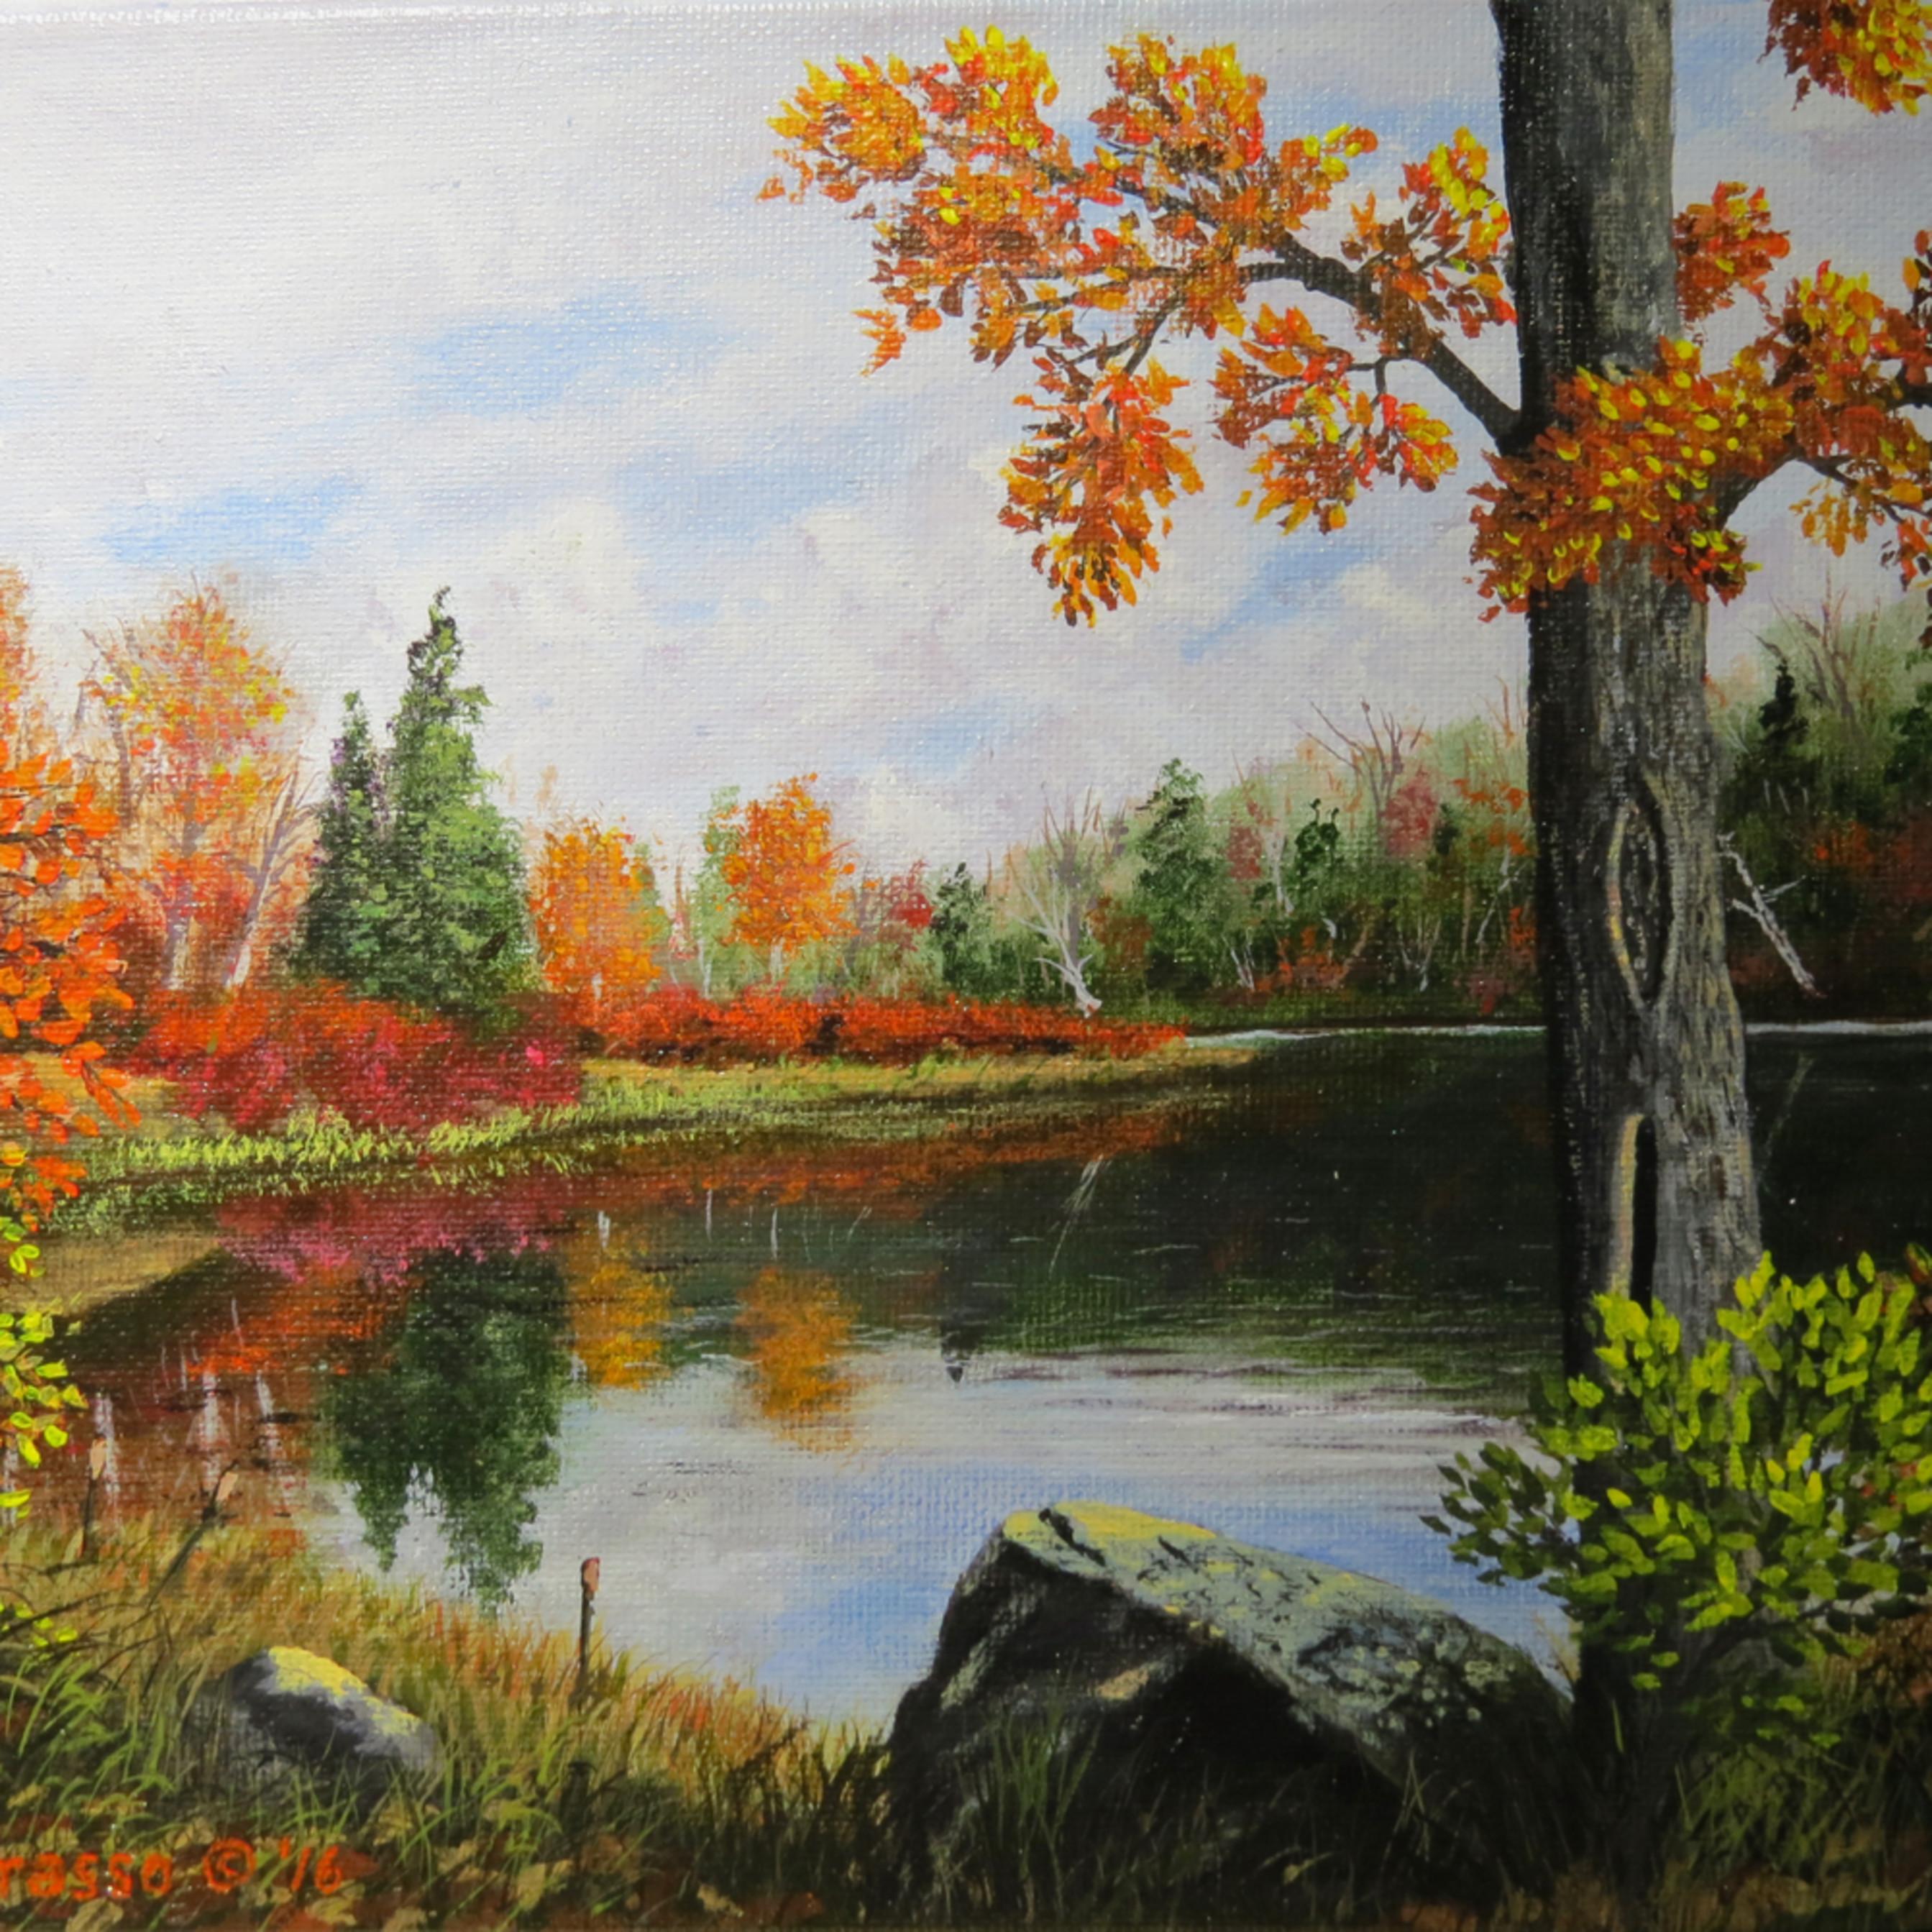 Autumn reflections kcl08k